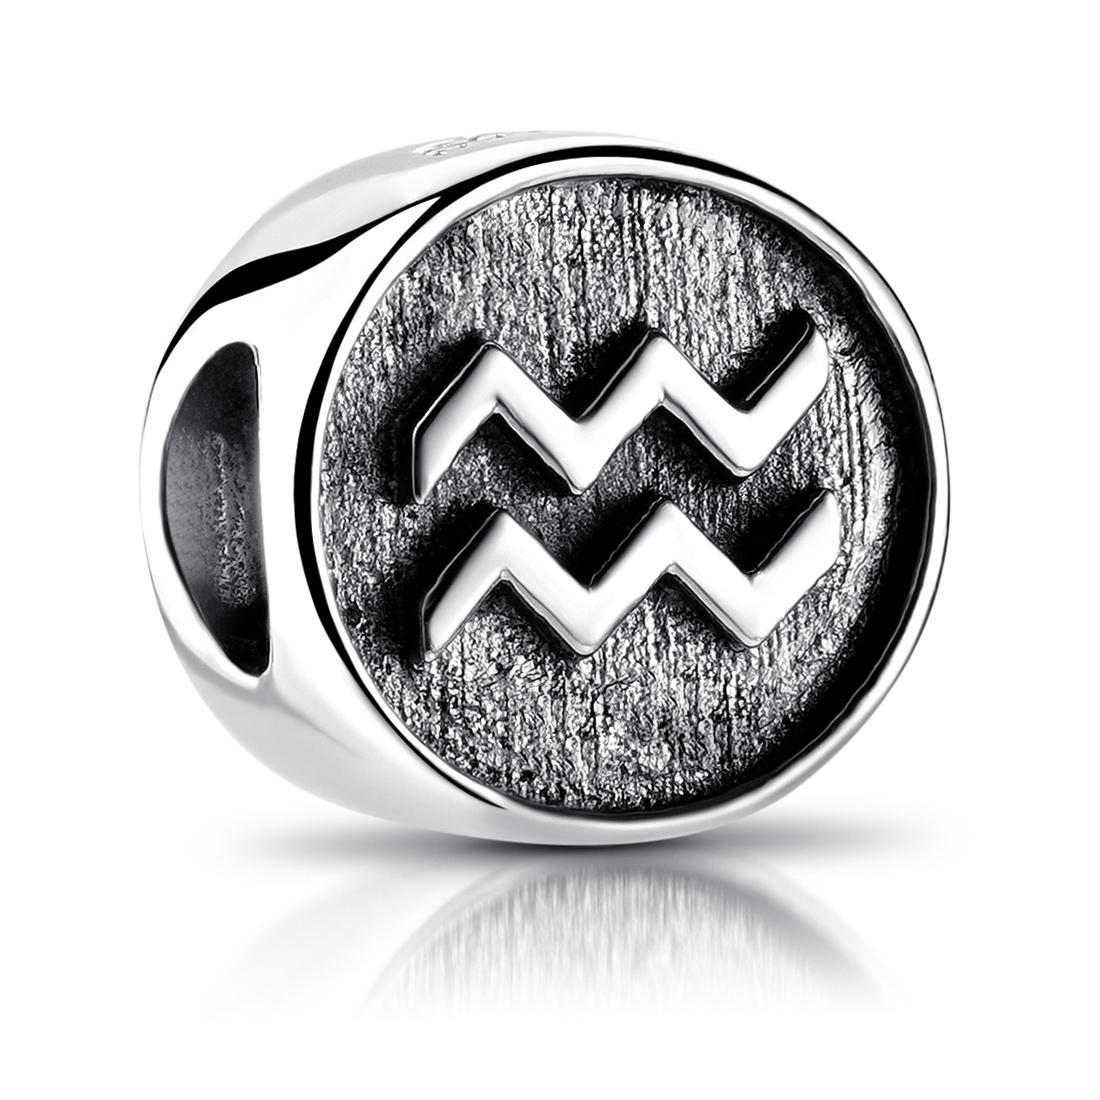 MATERIA Wassermann Sternzeichen Bead Armband Silber 925 Silber